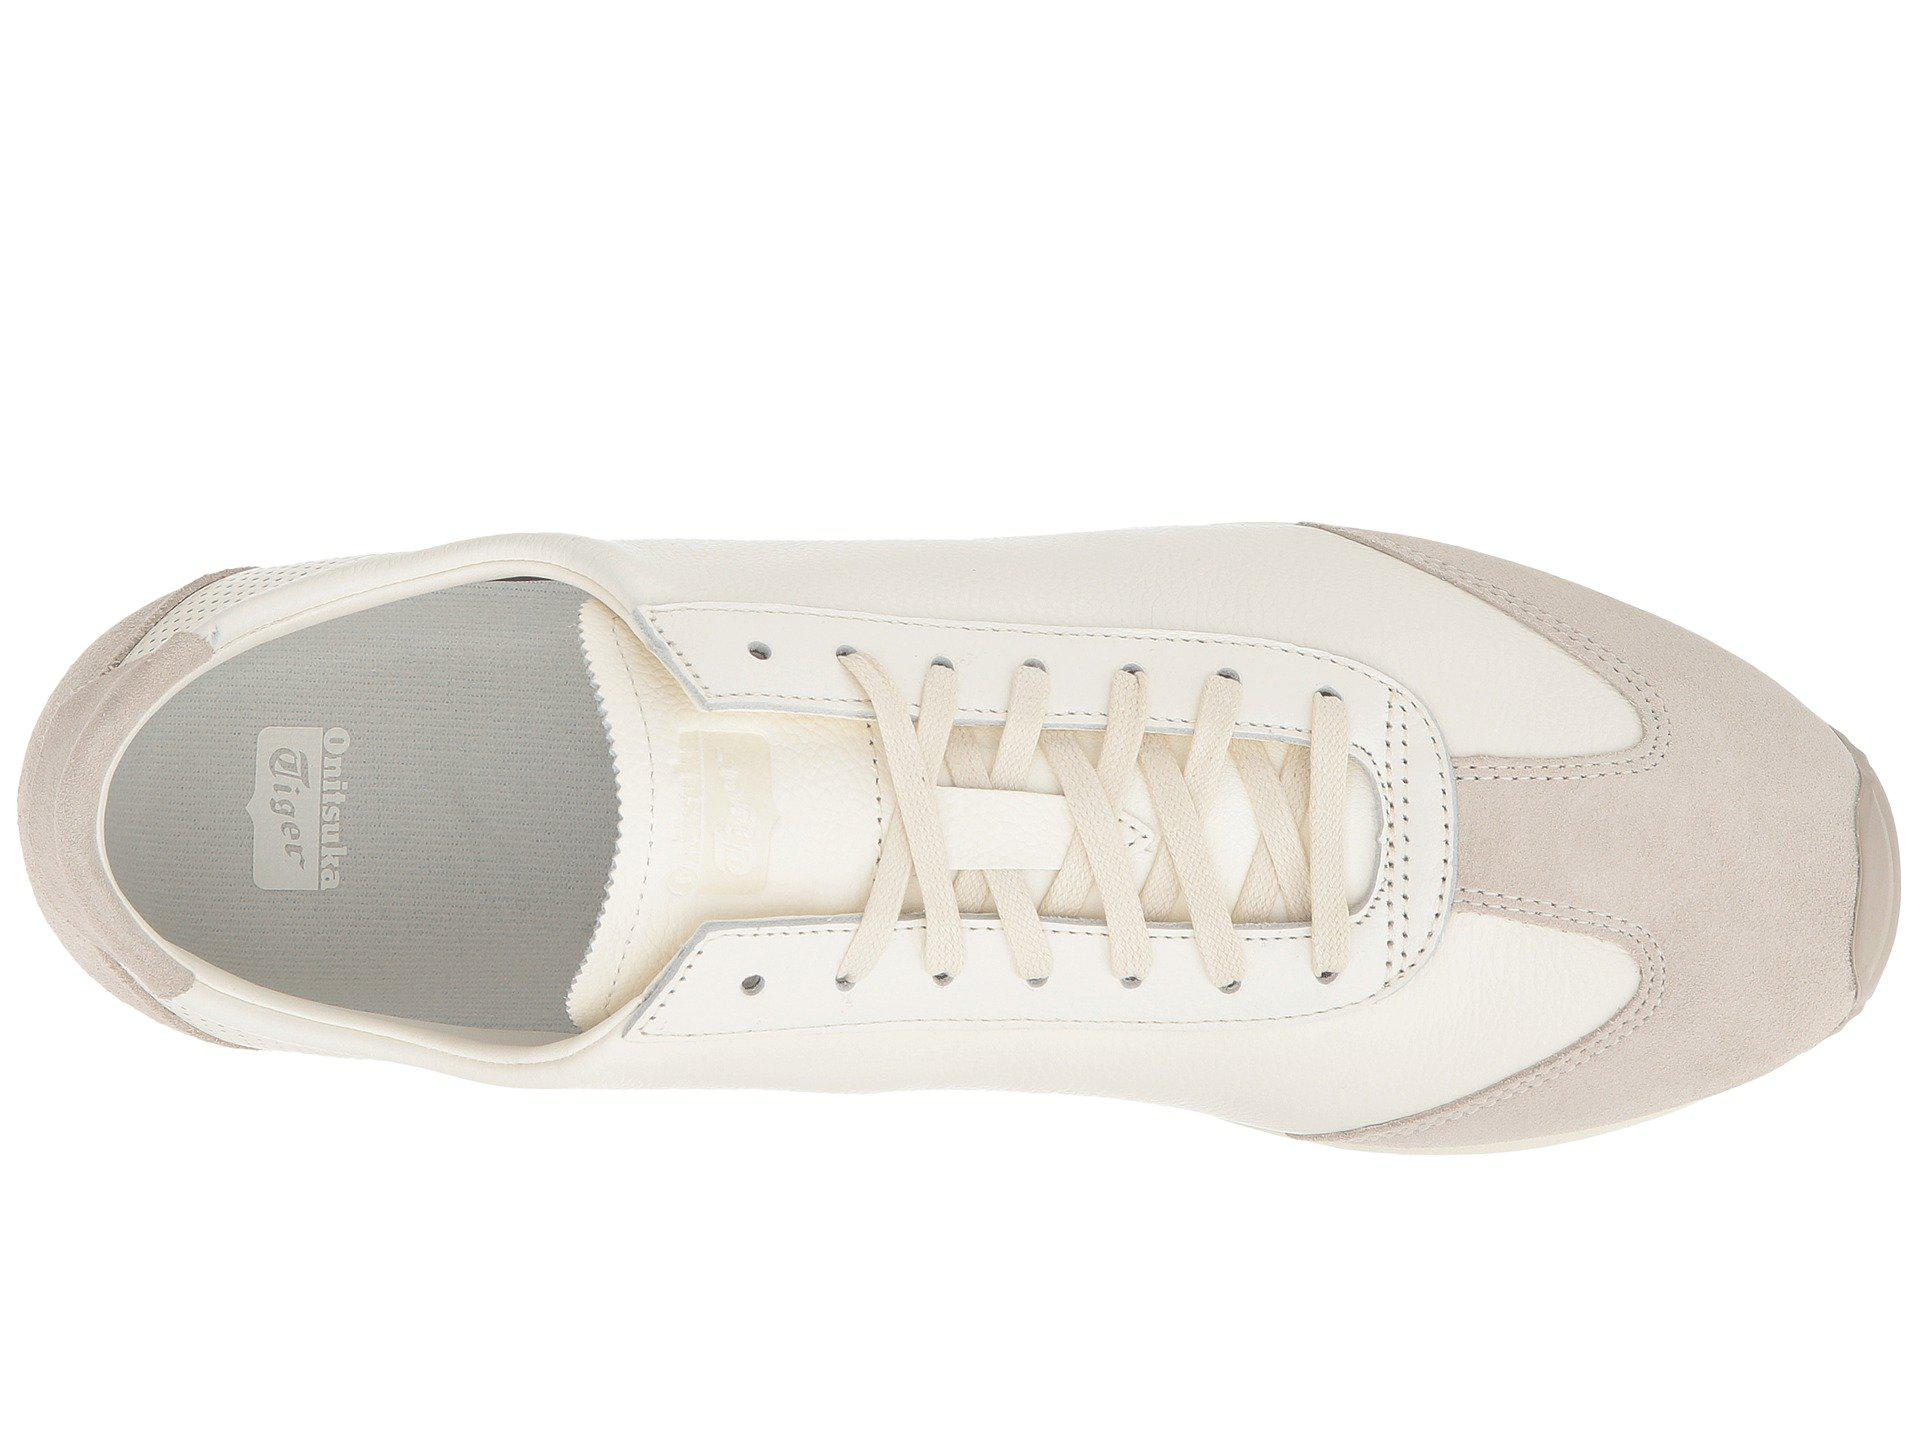 Lyst Tiger Asics Tiger Mhs Chaussures Cl (crème/ crème) Chaussures Mhs de sport en naturel 2f58adc - resepmasakannusantara.website